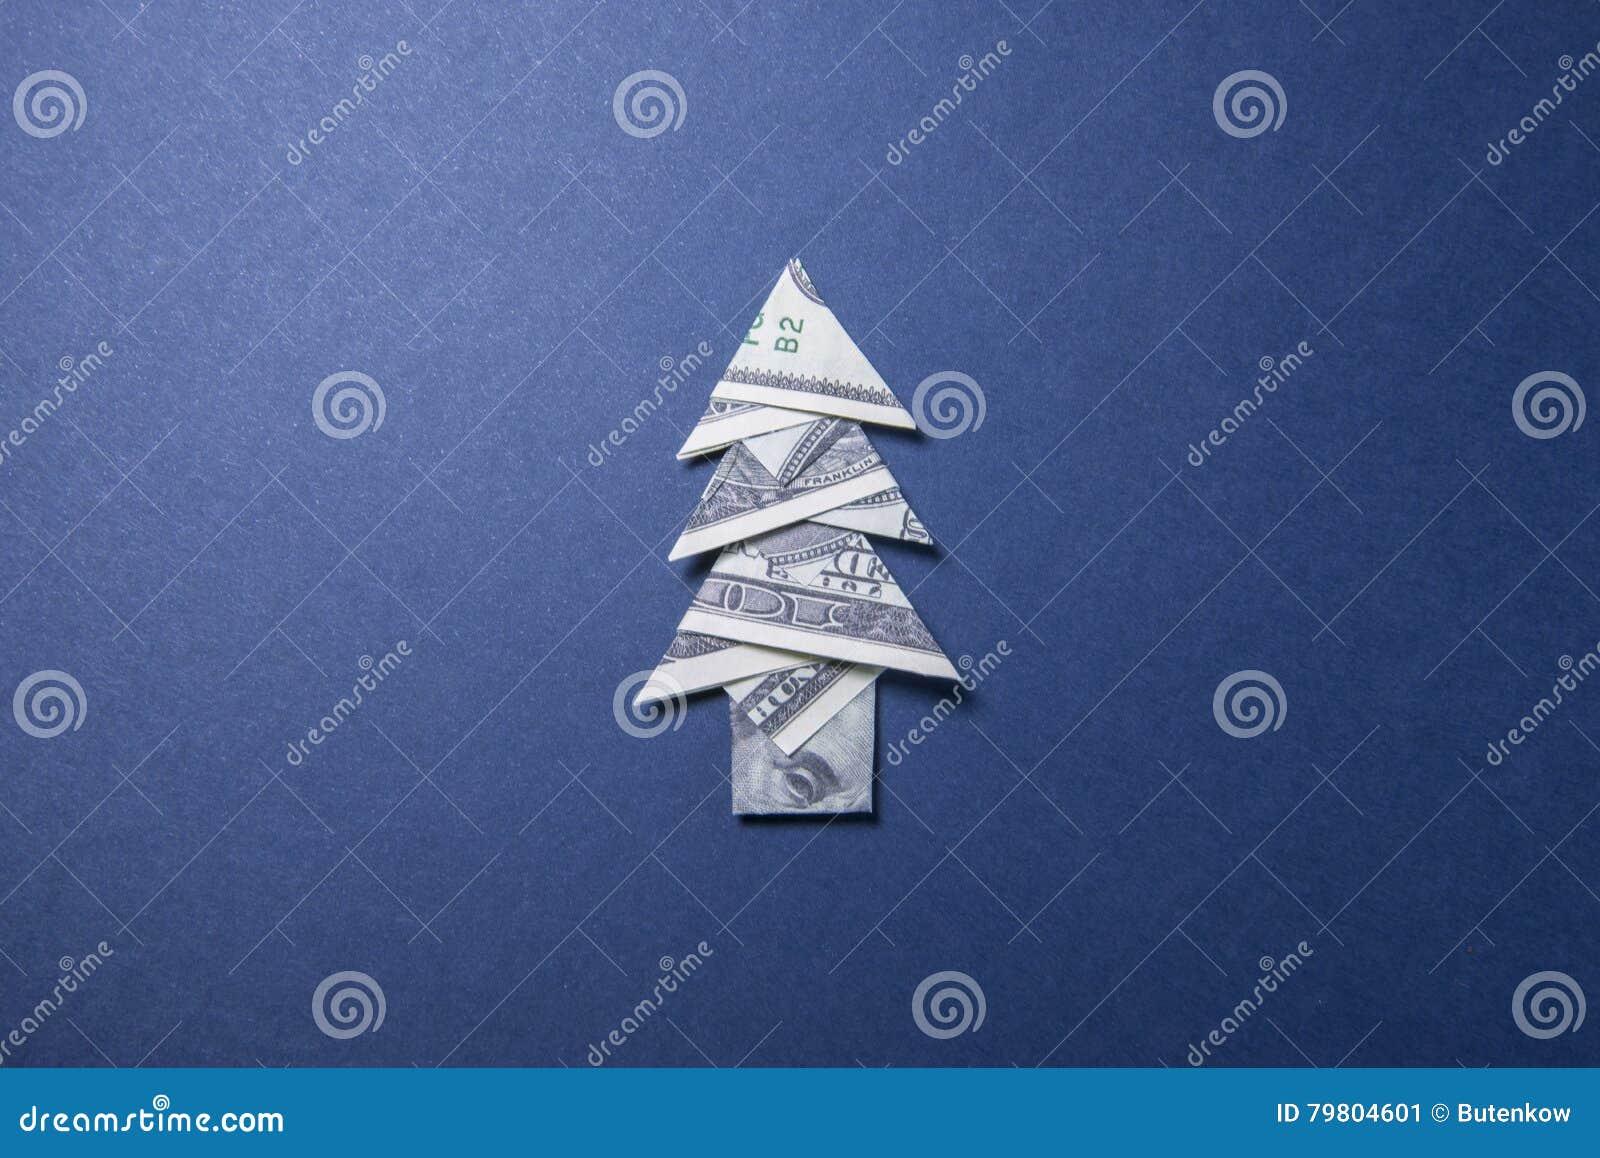 Money Origami Christmas tree Stock Photo - Alamy | 958x1300